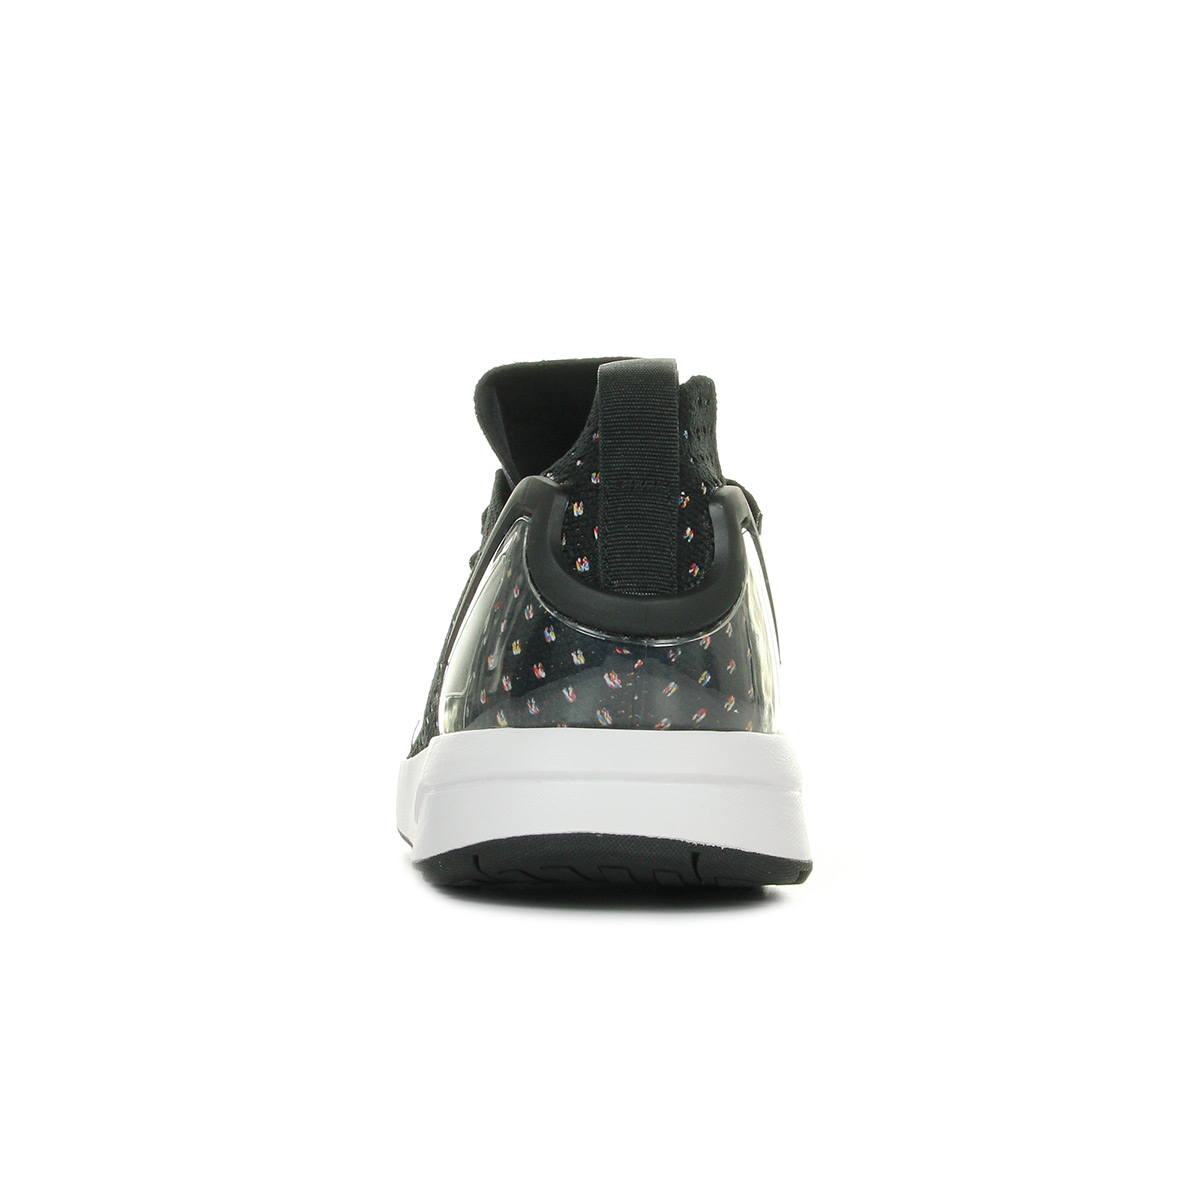 competitive price 4513d c47d7 adidas ZX Flux Adv Asymetrical Primeknit S76368, Baskets ...